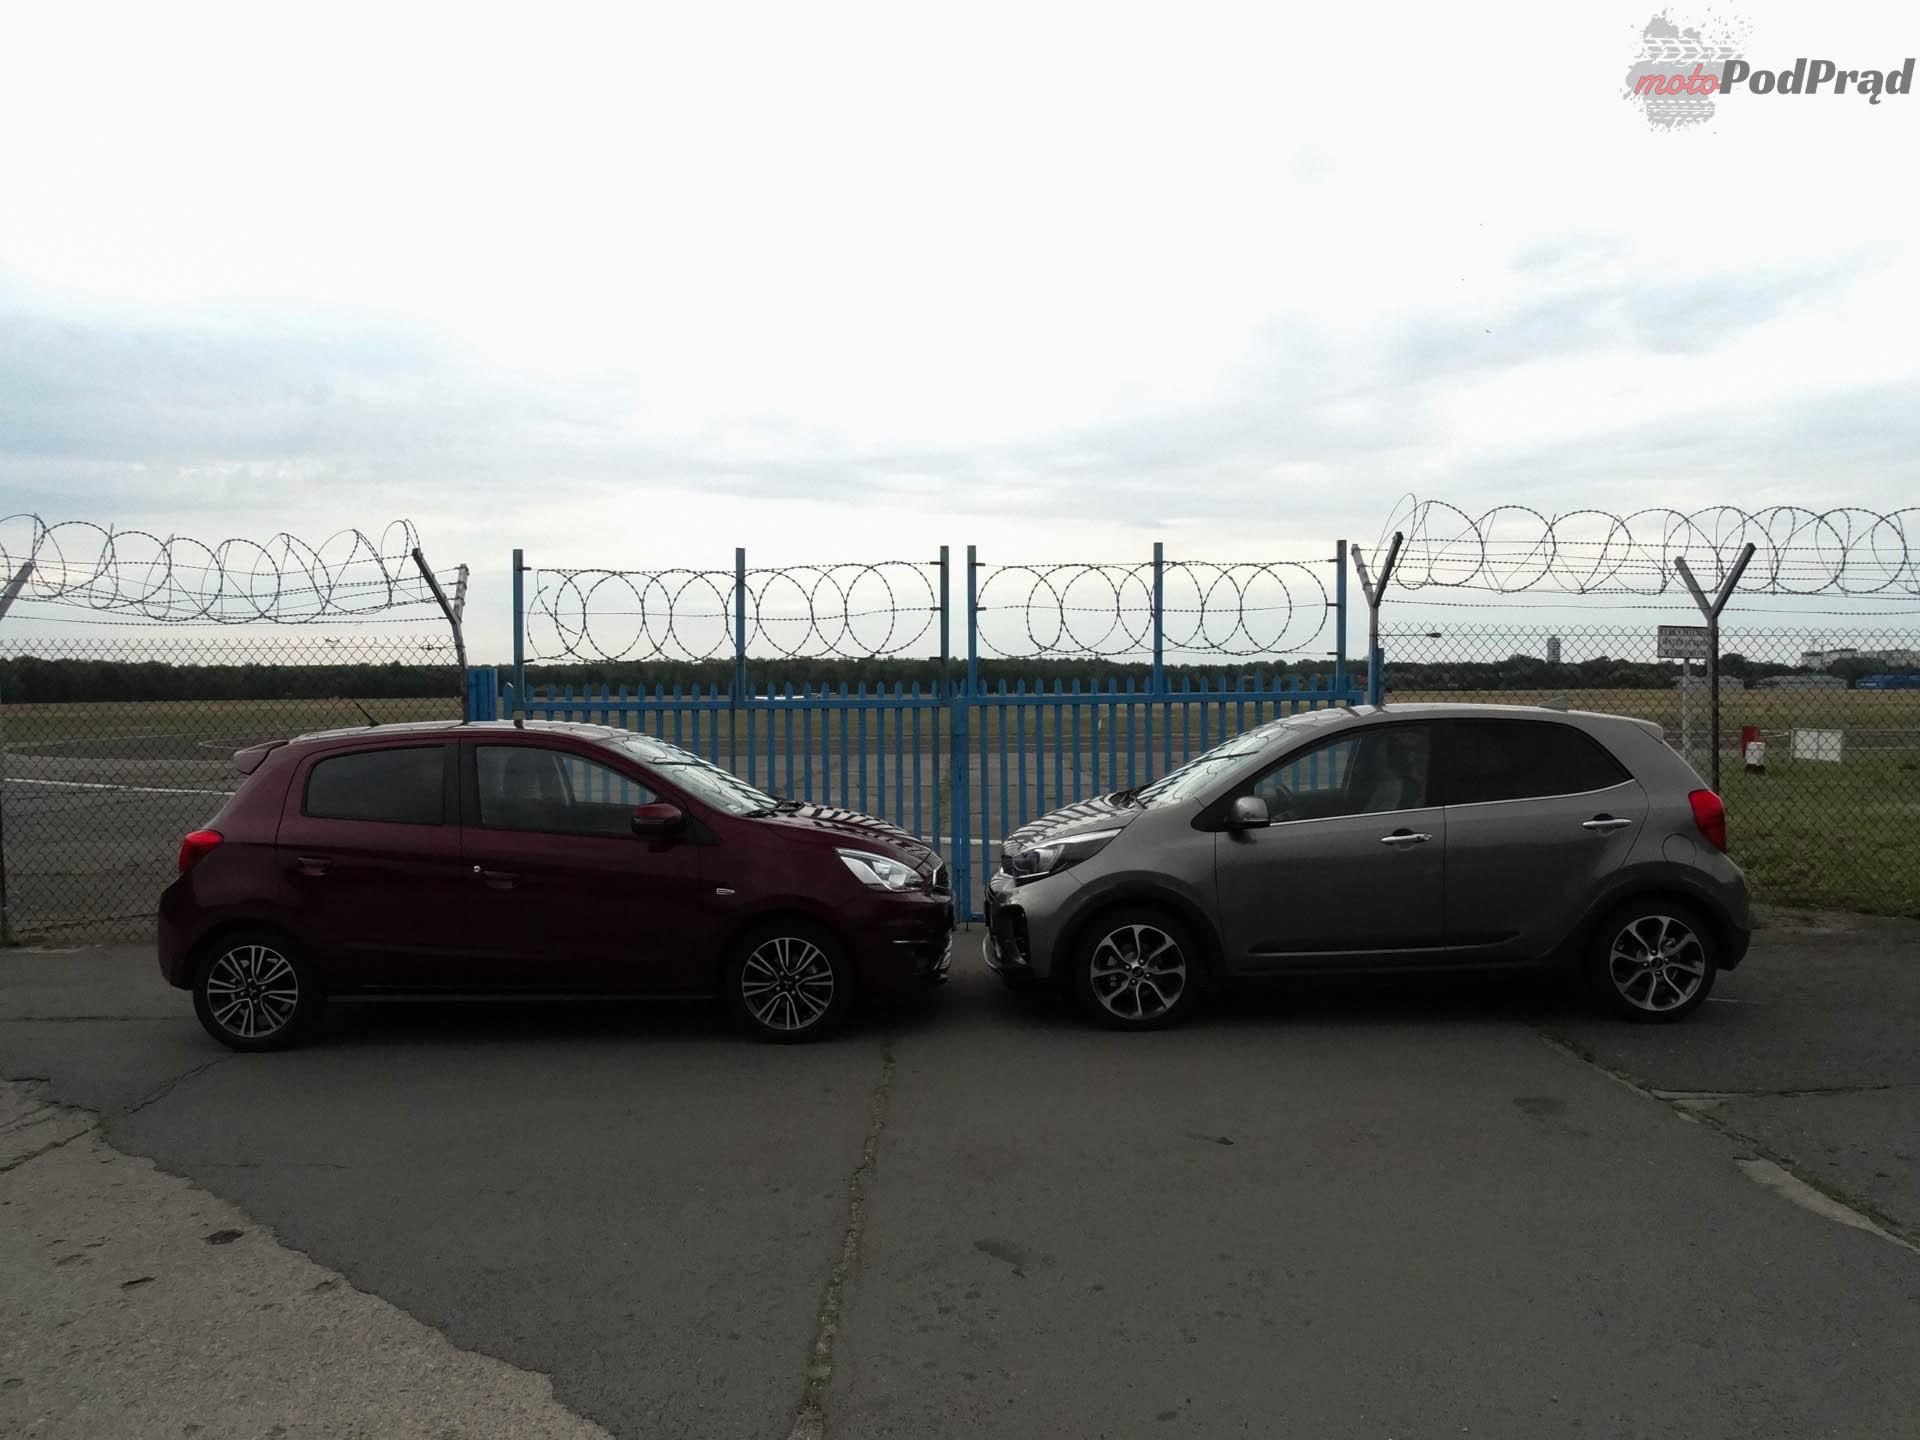 Kia Picanto vs Mitsubishi Space Star 9 Porównanie: Kia Picanto kontra Mitsubishi Space Star   dwa światy